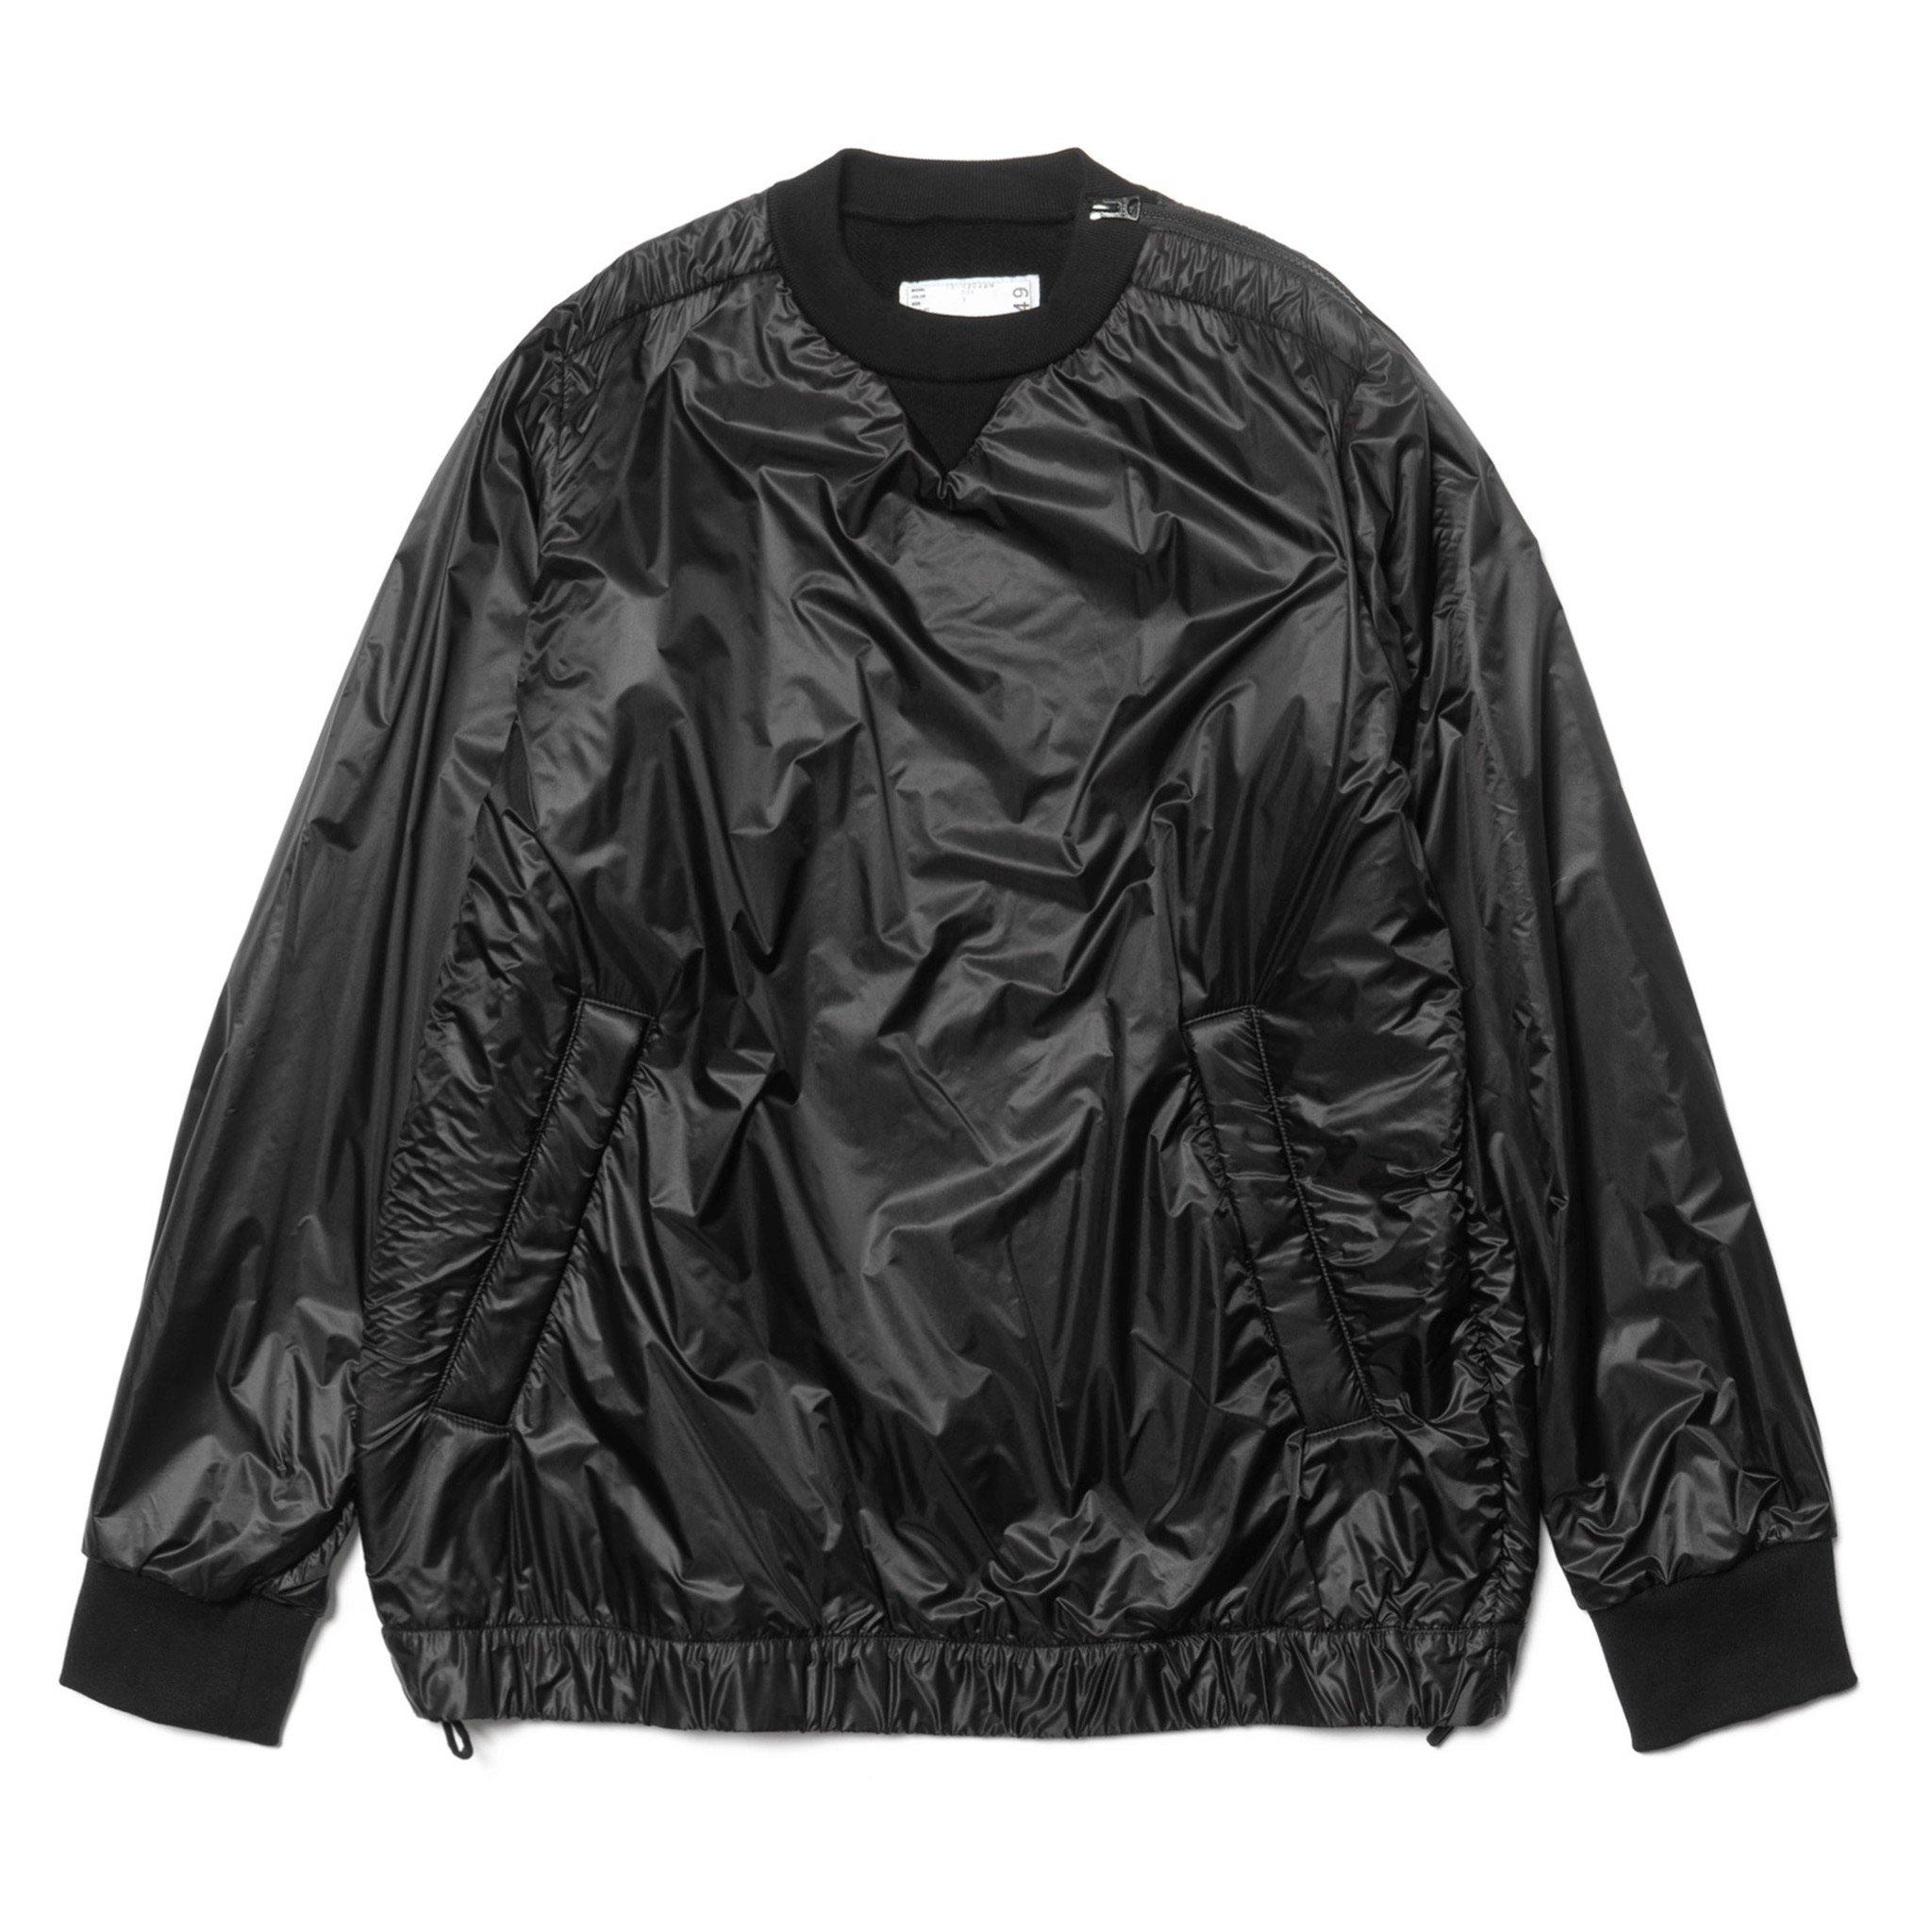 HAVEN-Sacai-Nylon-Pullover-BLACK-1_2048x2048.progressive.jpg